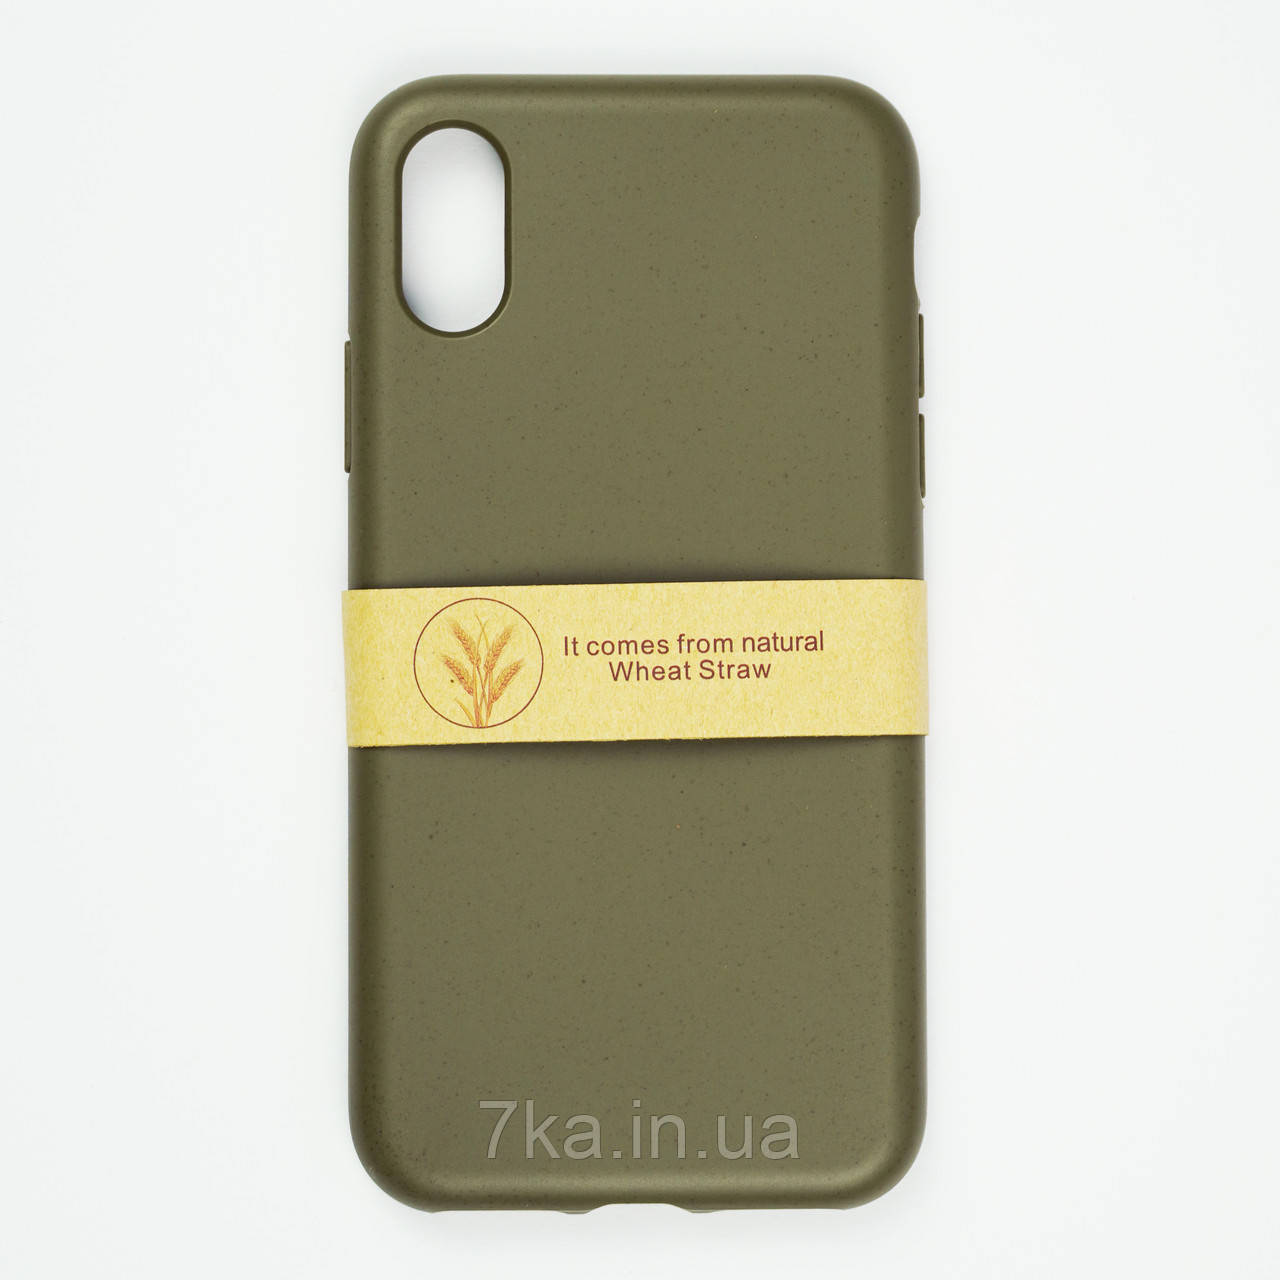 Биоразлагаемый чехол ECO Wheat Straw для iPhone XR Green